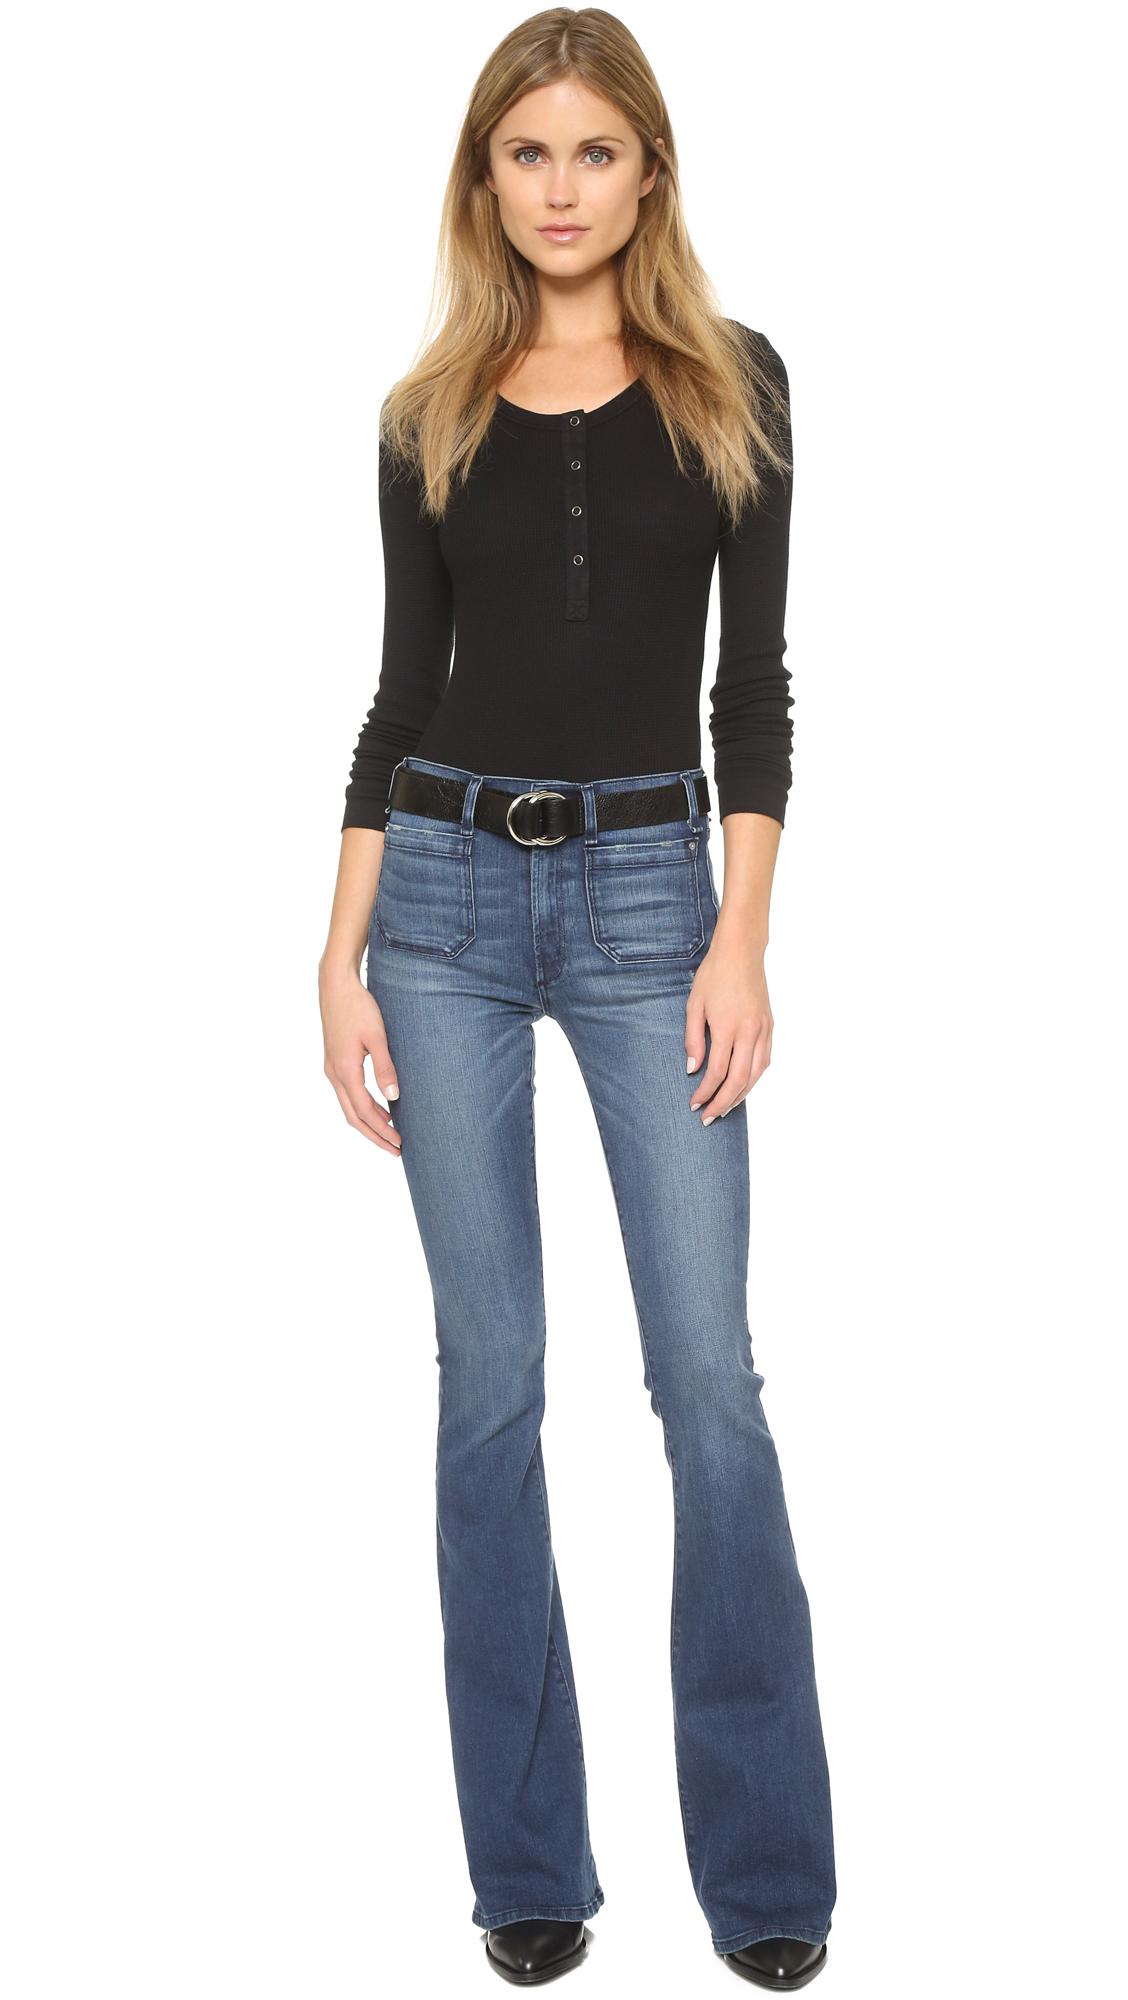 3232973dfb4 McGuire Denim The Principle Mid Rise Flare Jeans